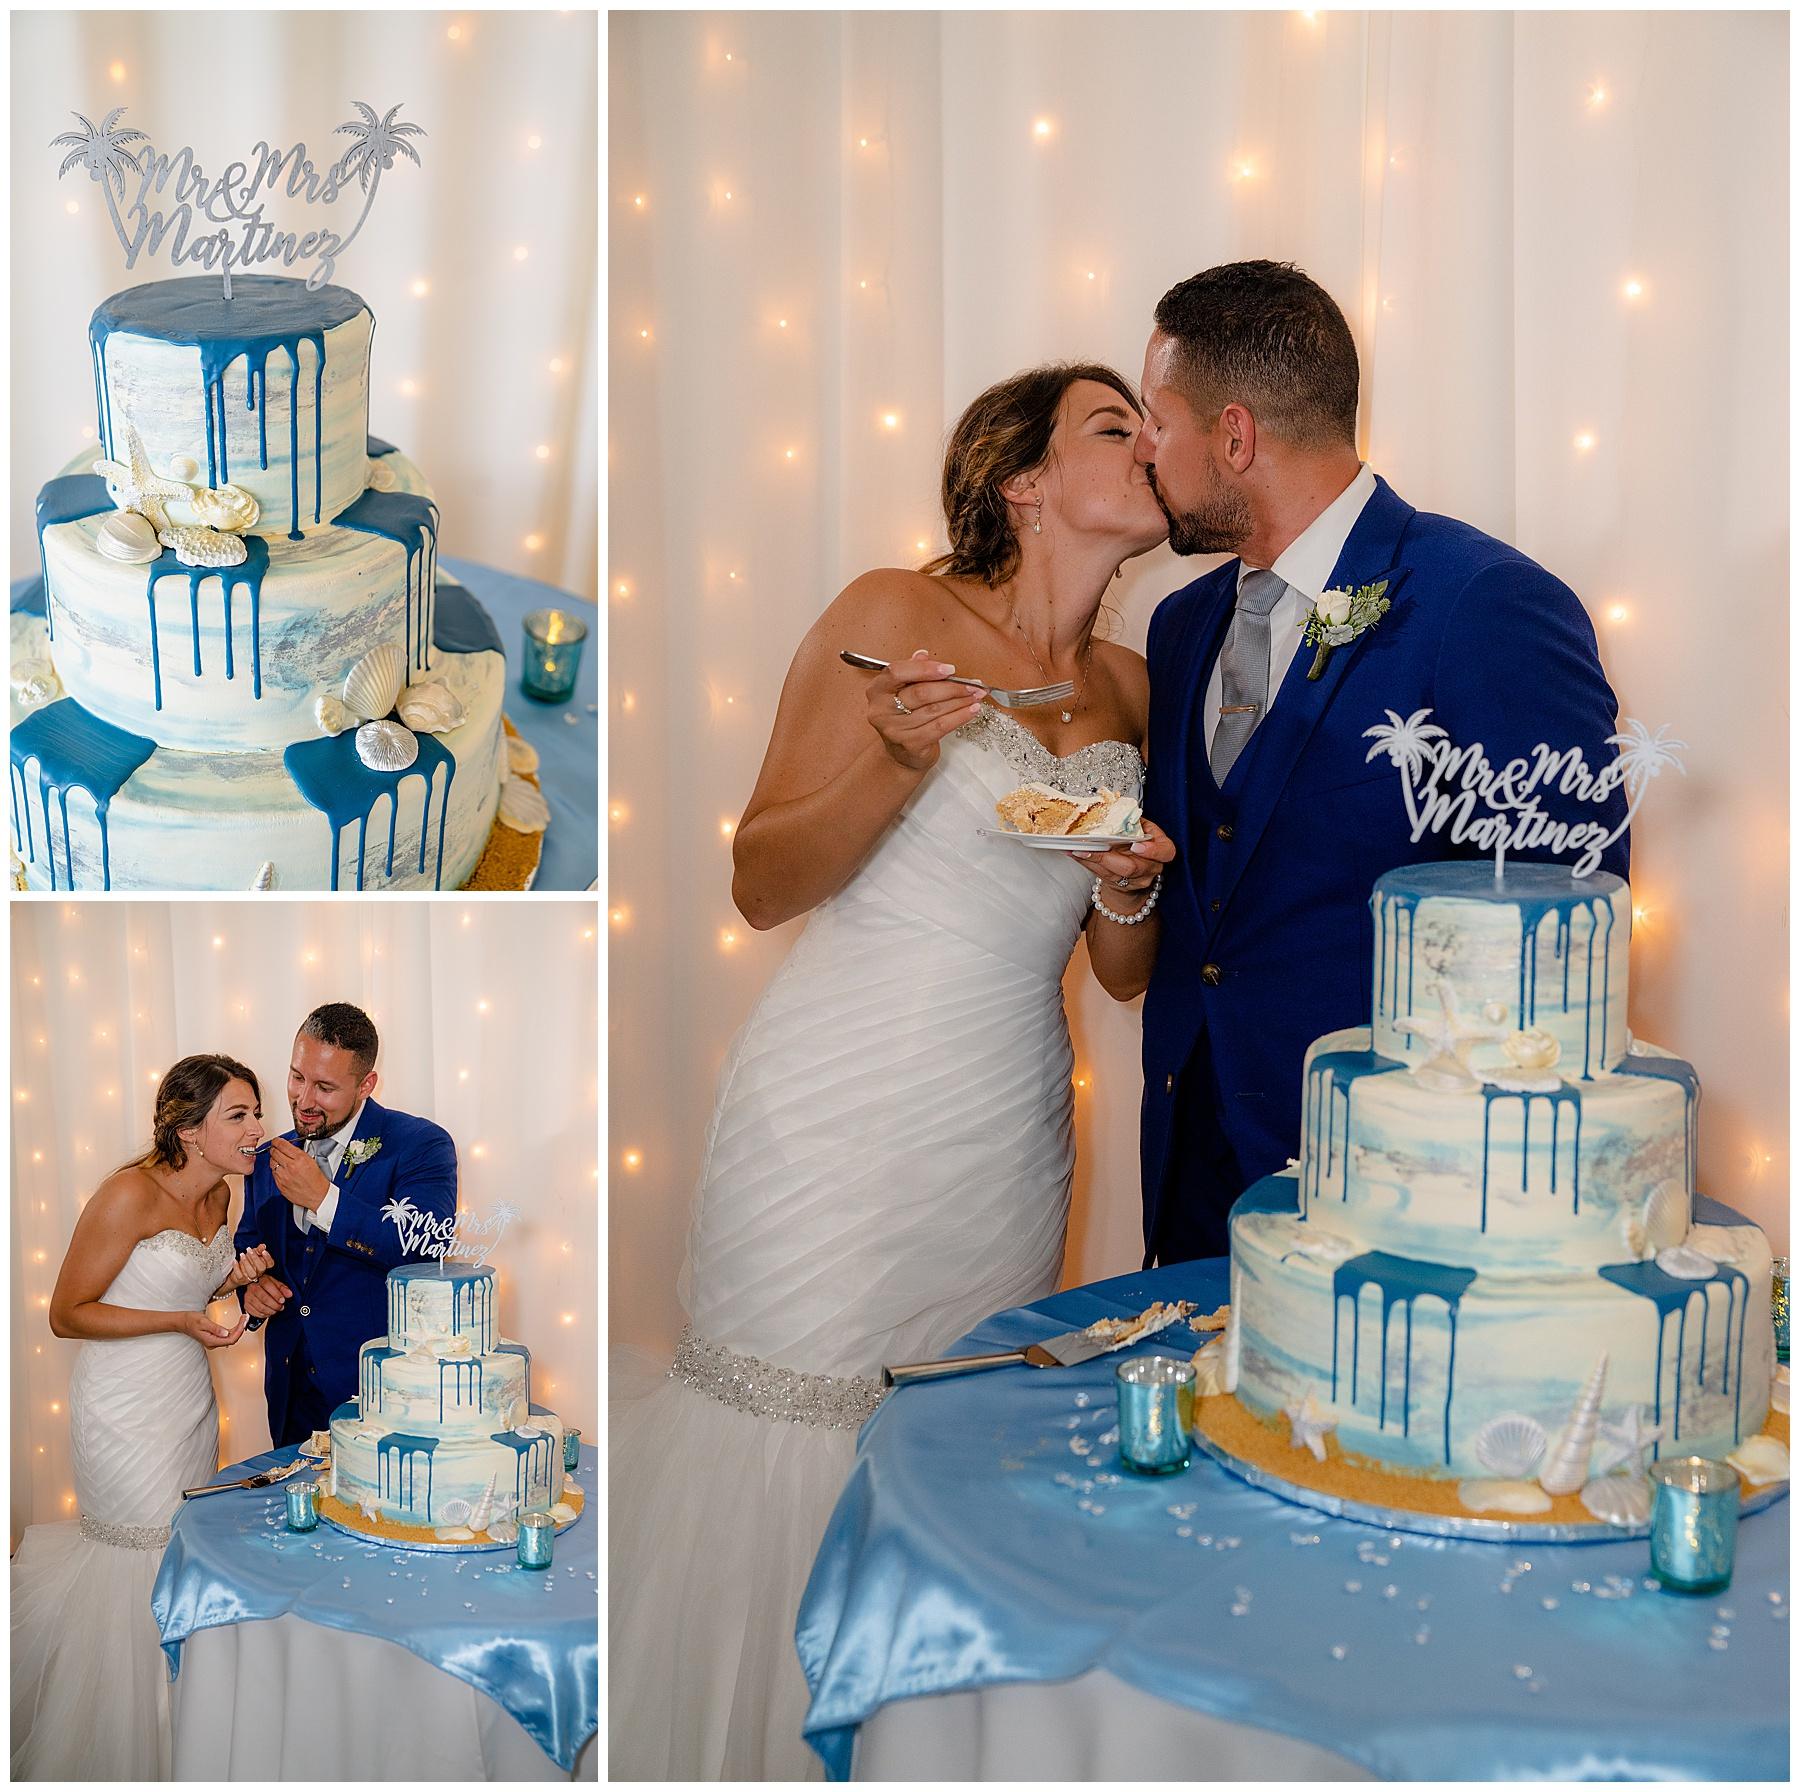 beach wedding cake ideas